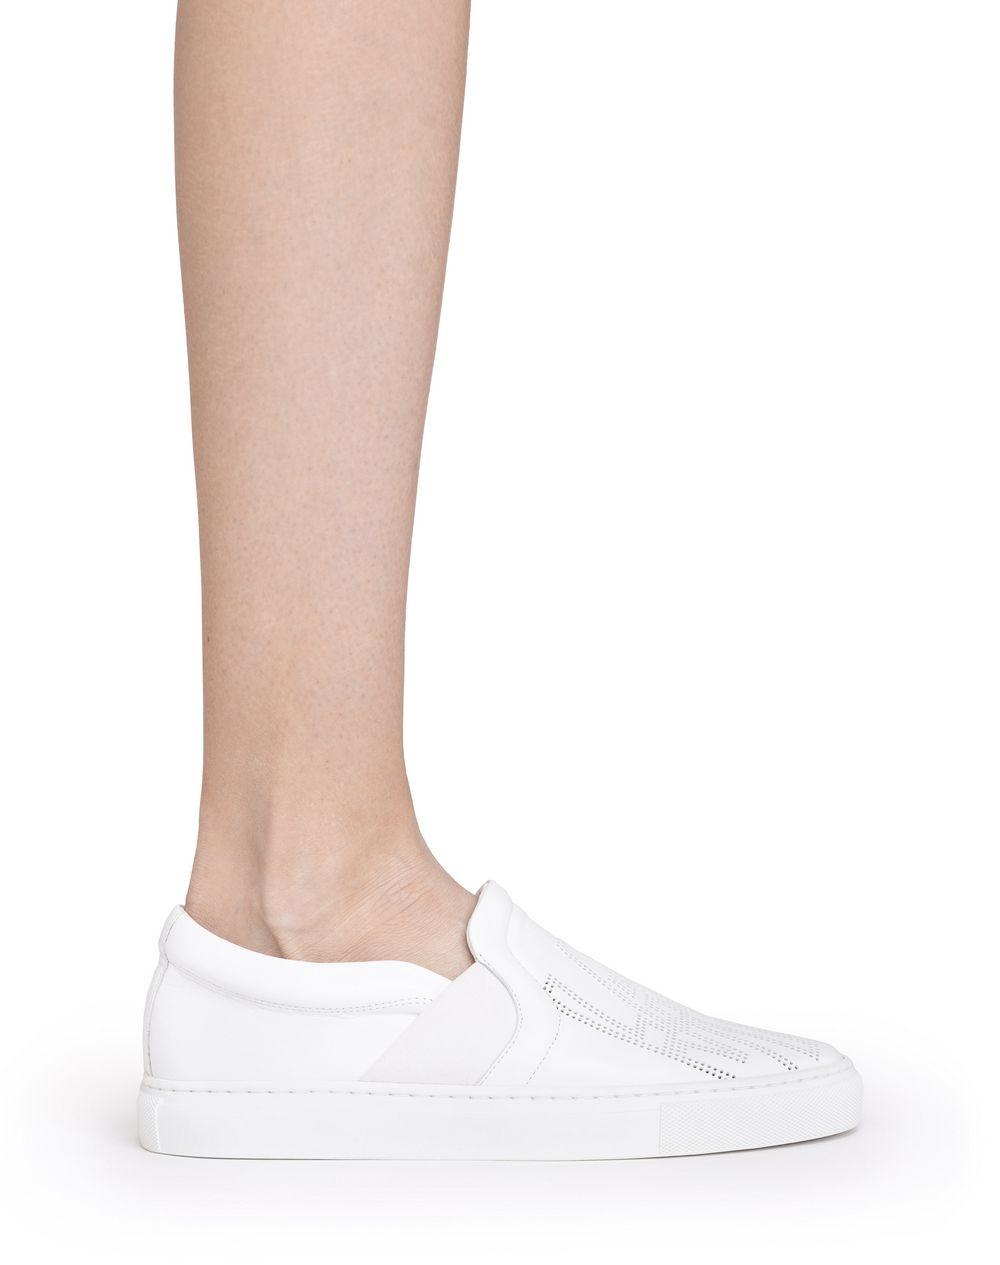 Lanvin PERFORATED LOGO SLIP ONS, Sneakers Women | Lanvin ...